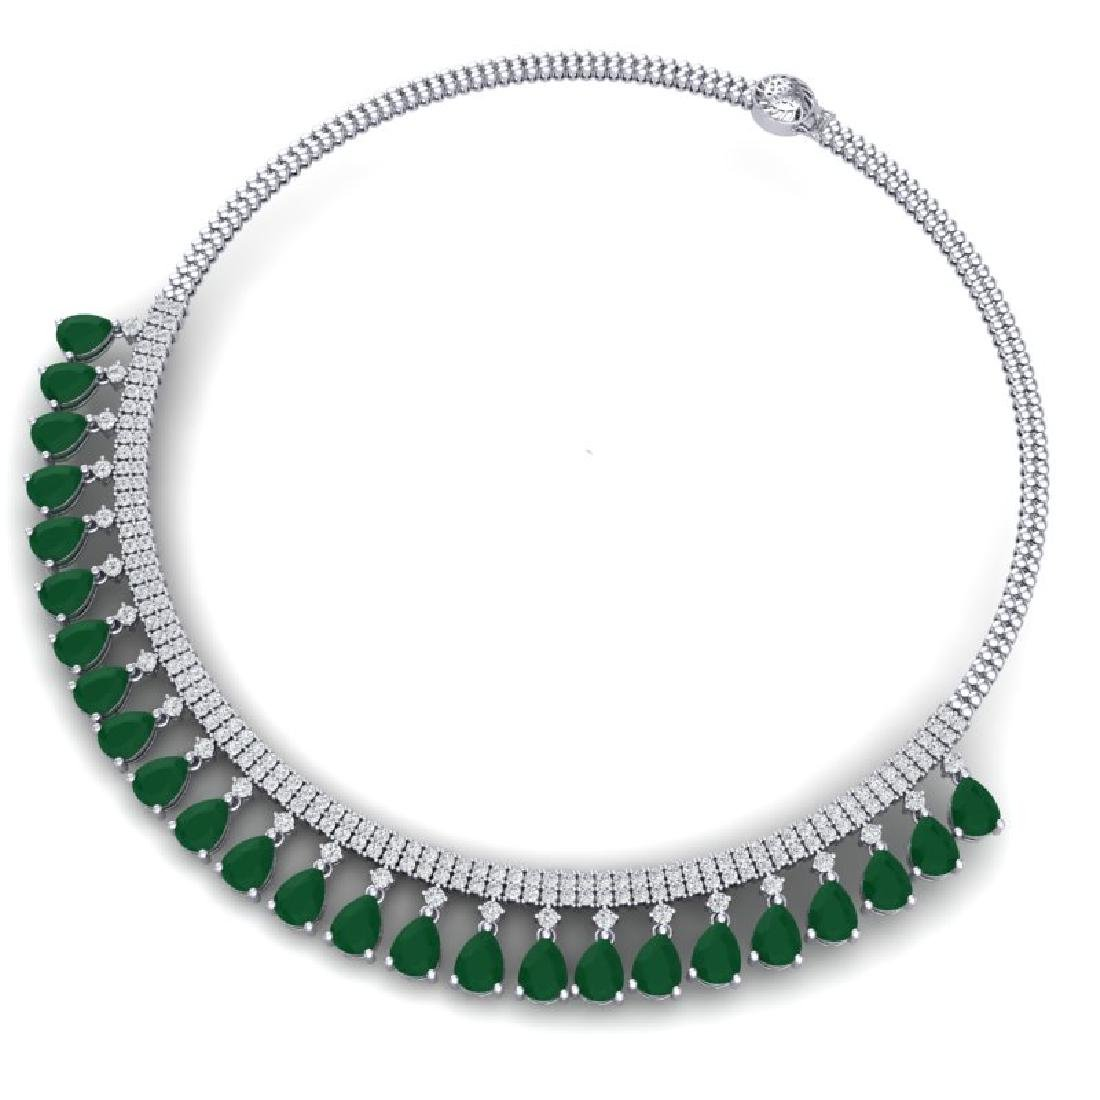 51.75 CTW Royalty Emerald & VS Diamond Necklace 18K - 3